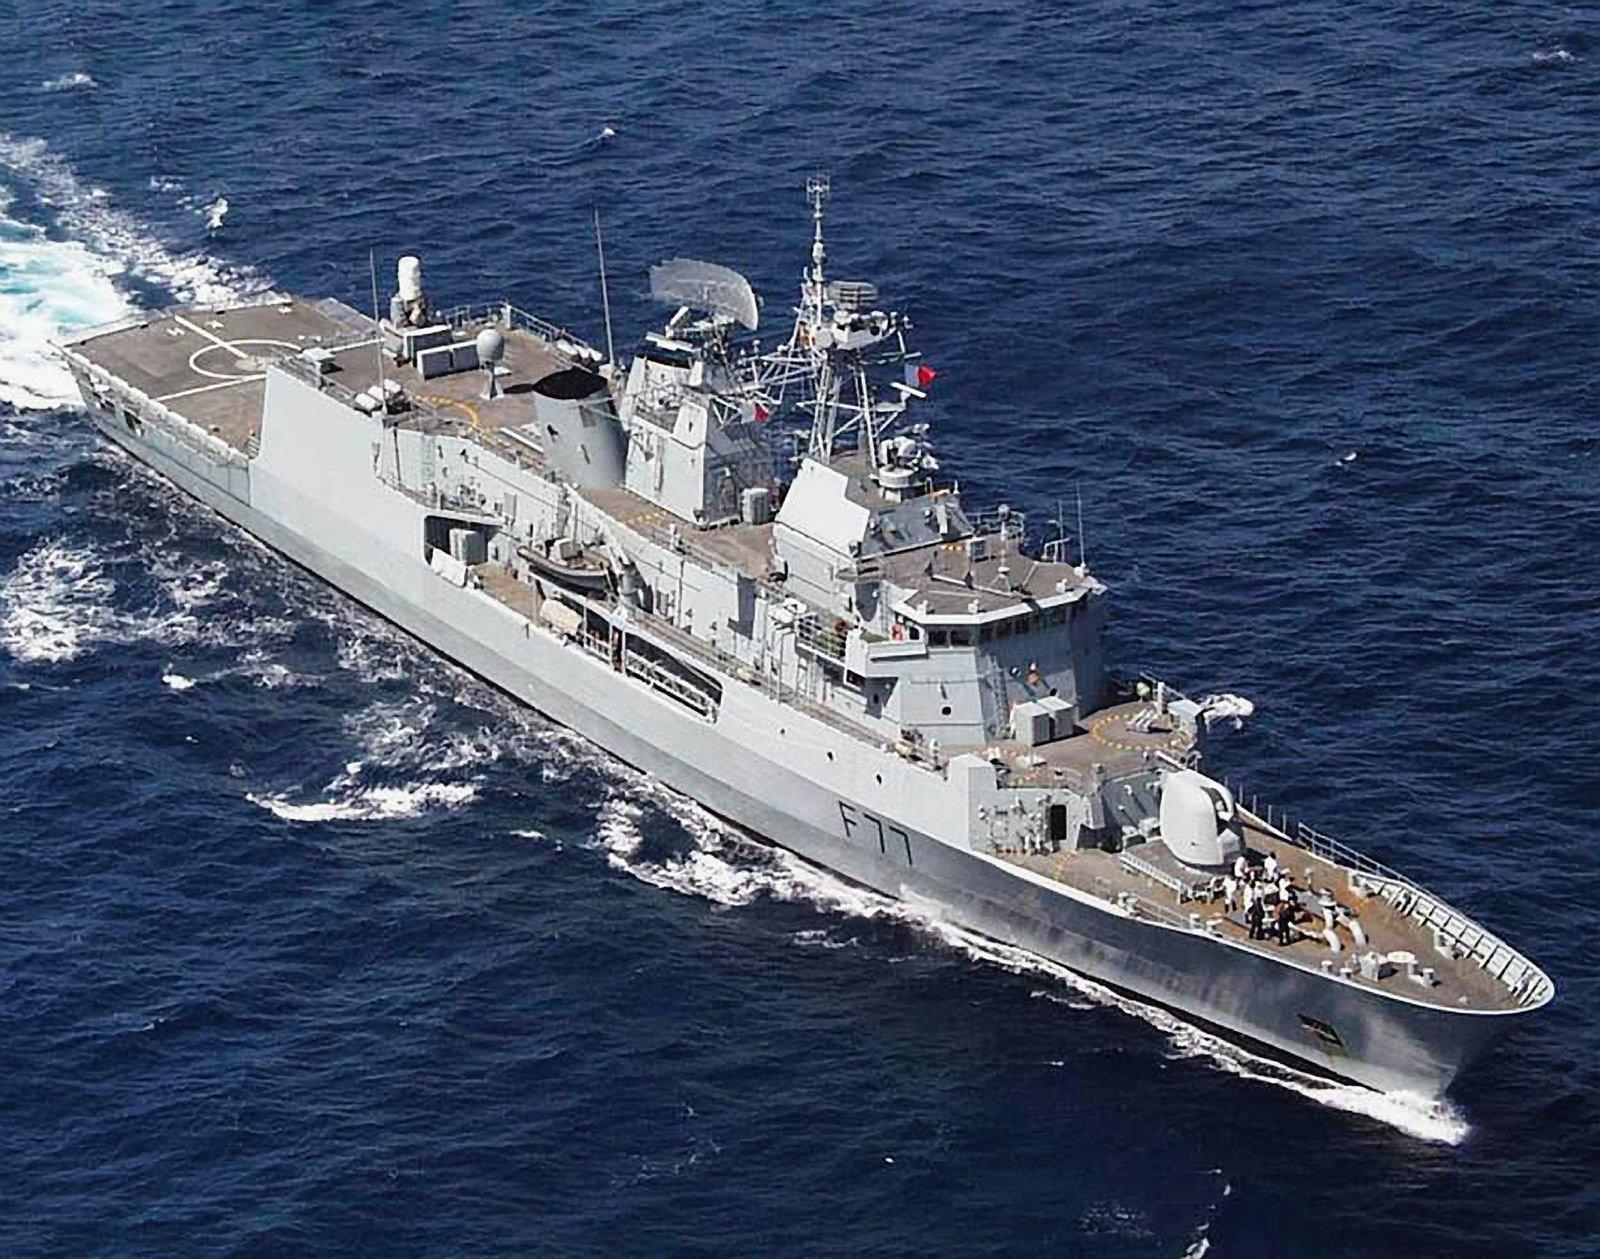 new_zealand_navy_-_frigate_hmnzs_te_kaha_-_9